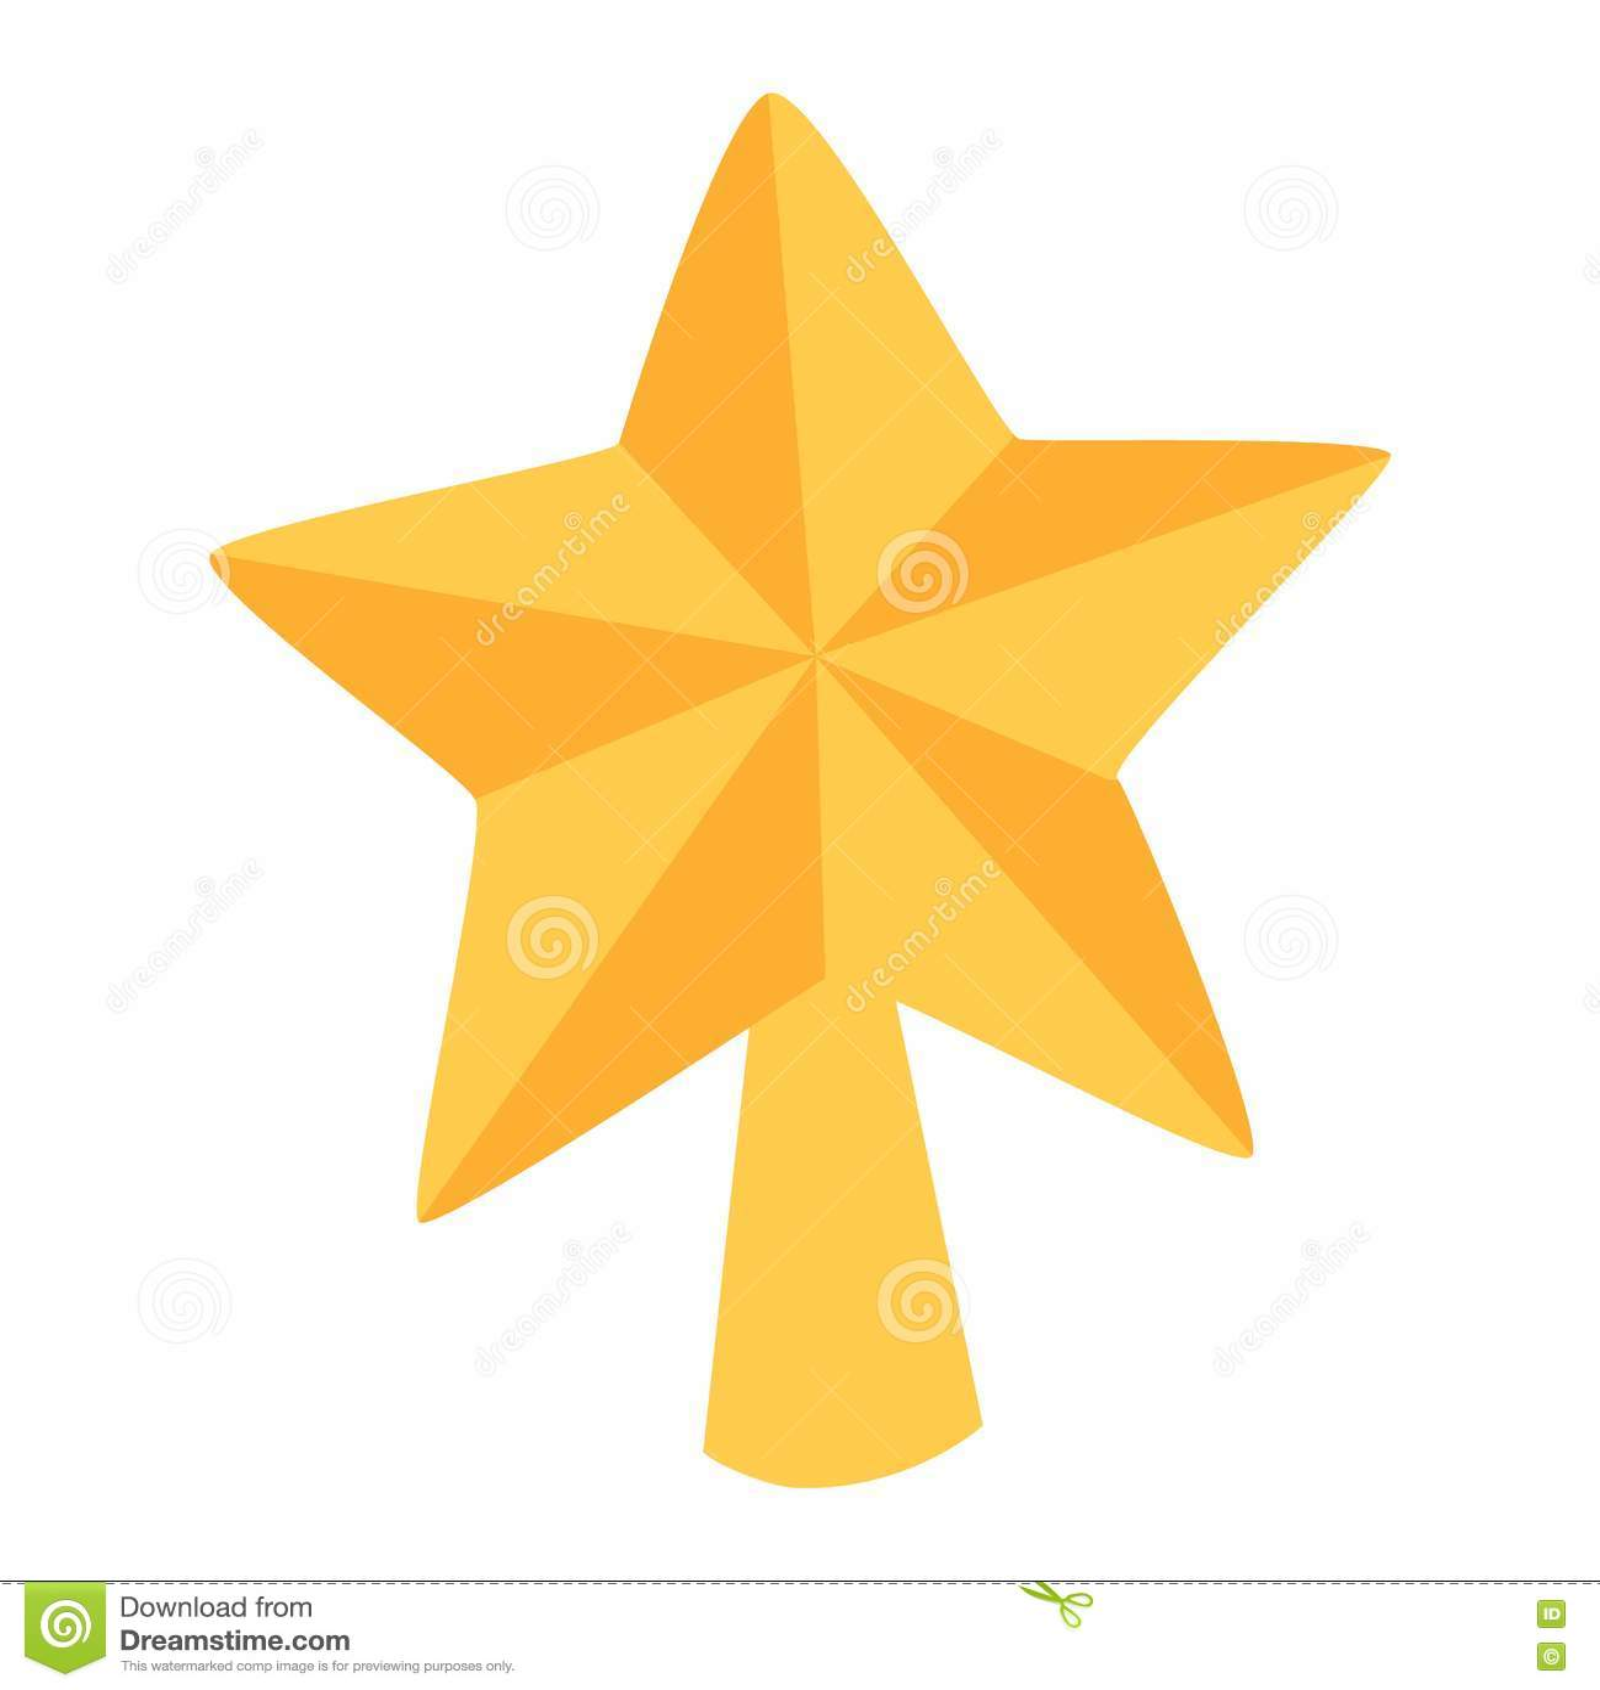 Christmas Tree Star.Christmas Star Tree Symbol Vector Stock Vector